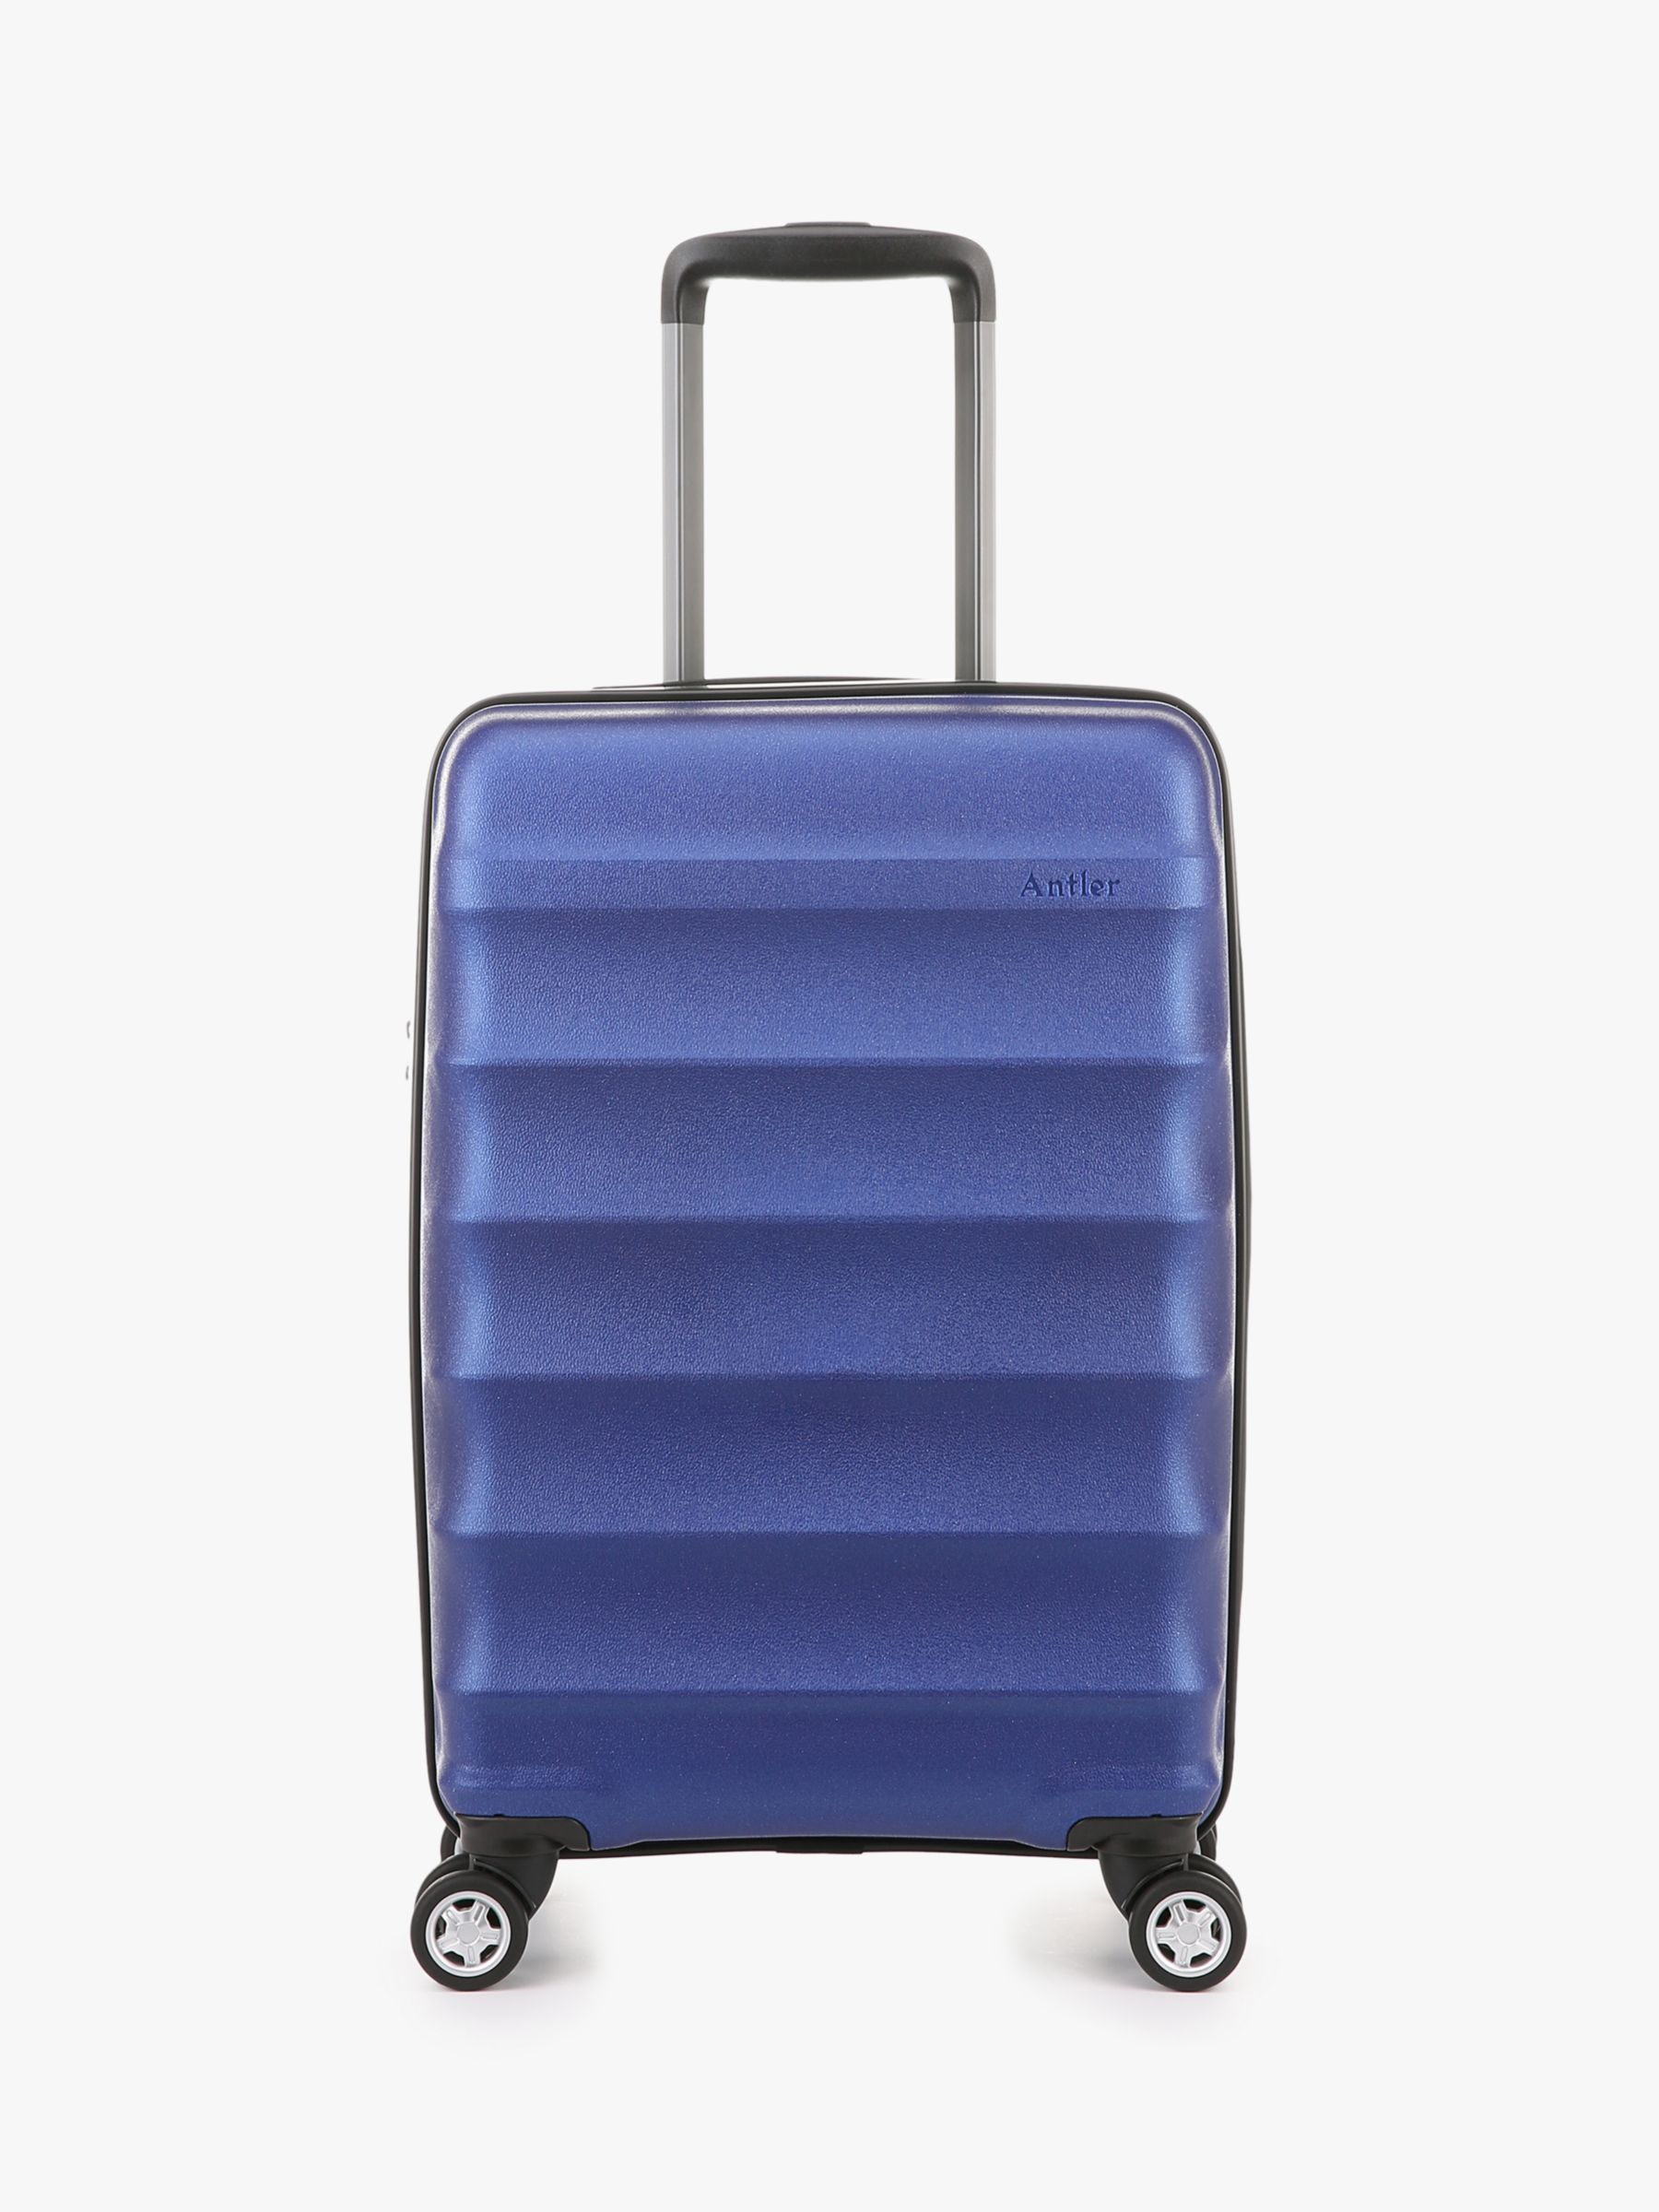 Antler Antler Juno Metallic 4-Wheel 56cm Cabin Suitcase